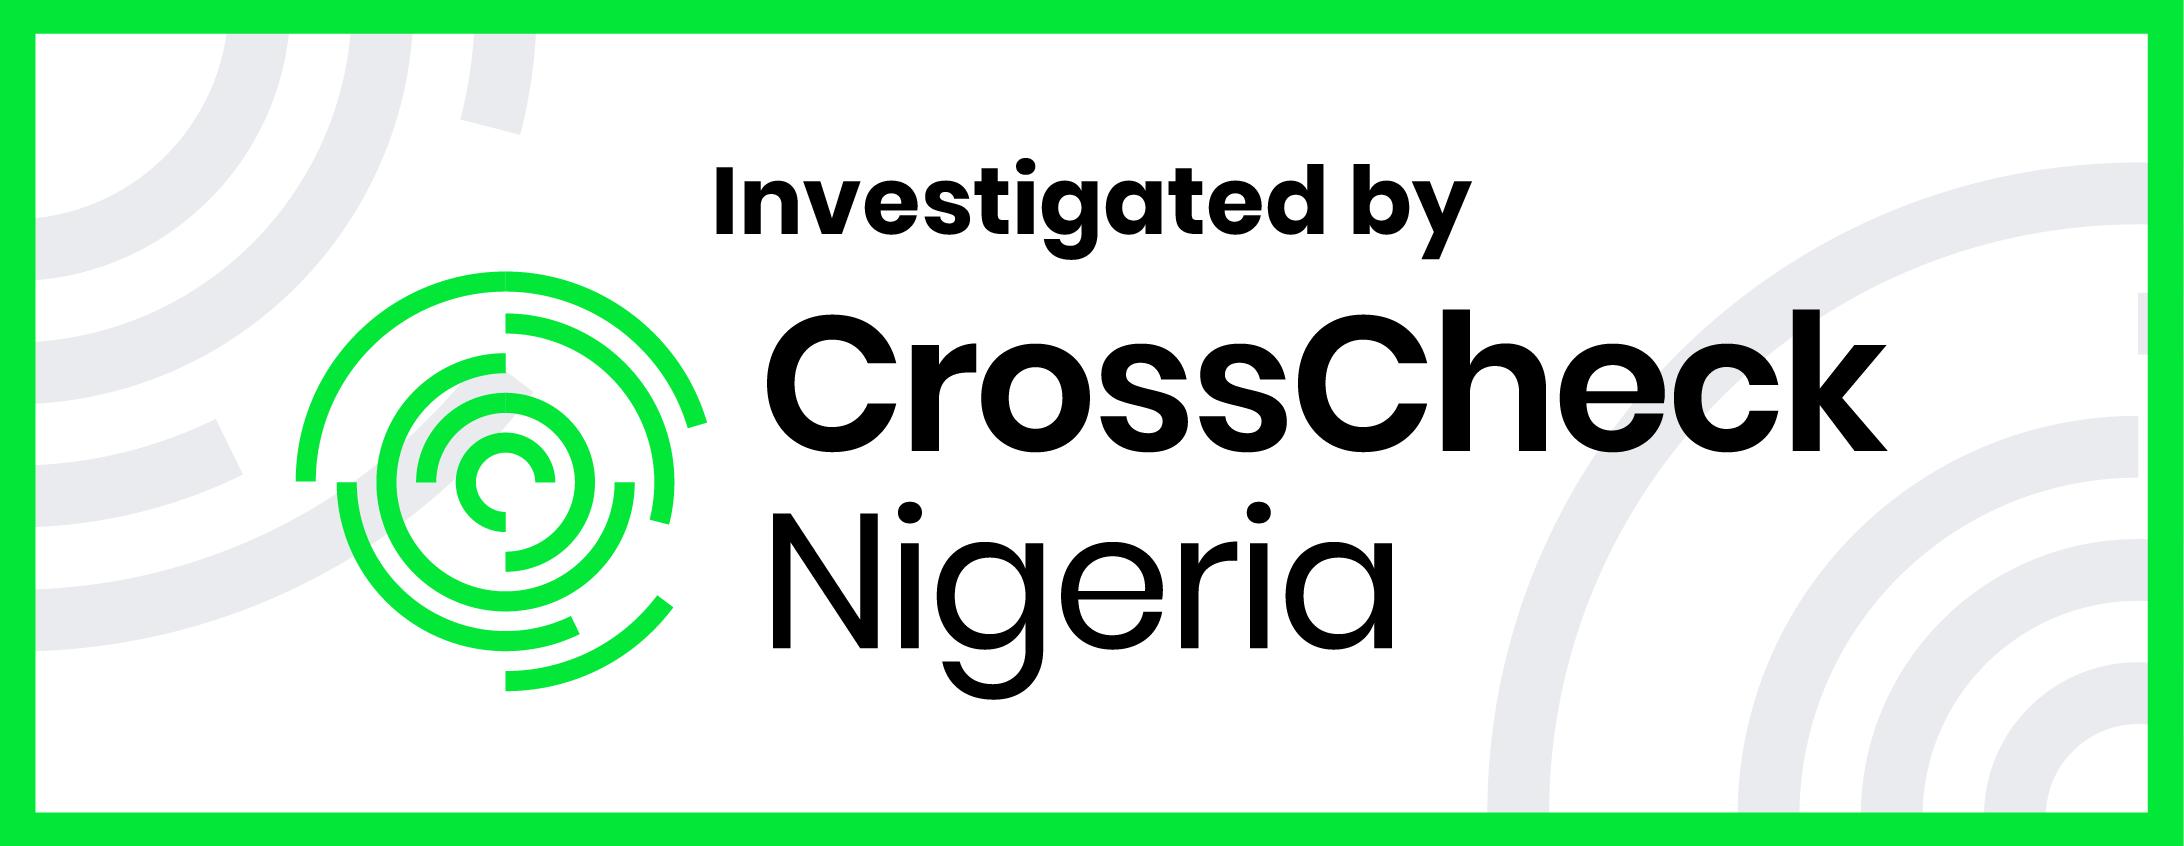 Investigated CrossCheck Nigeria